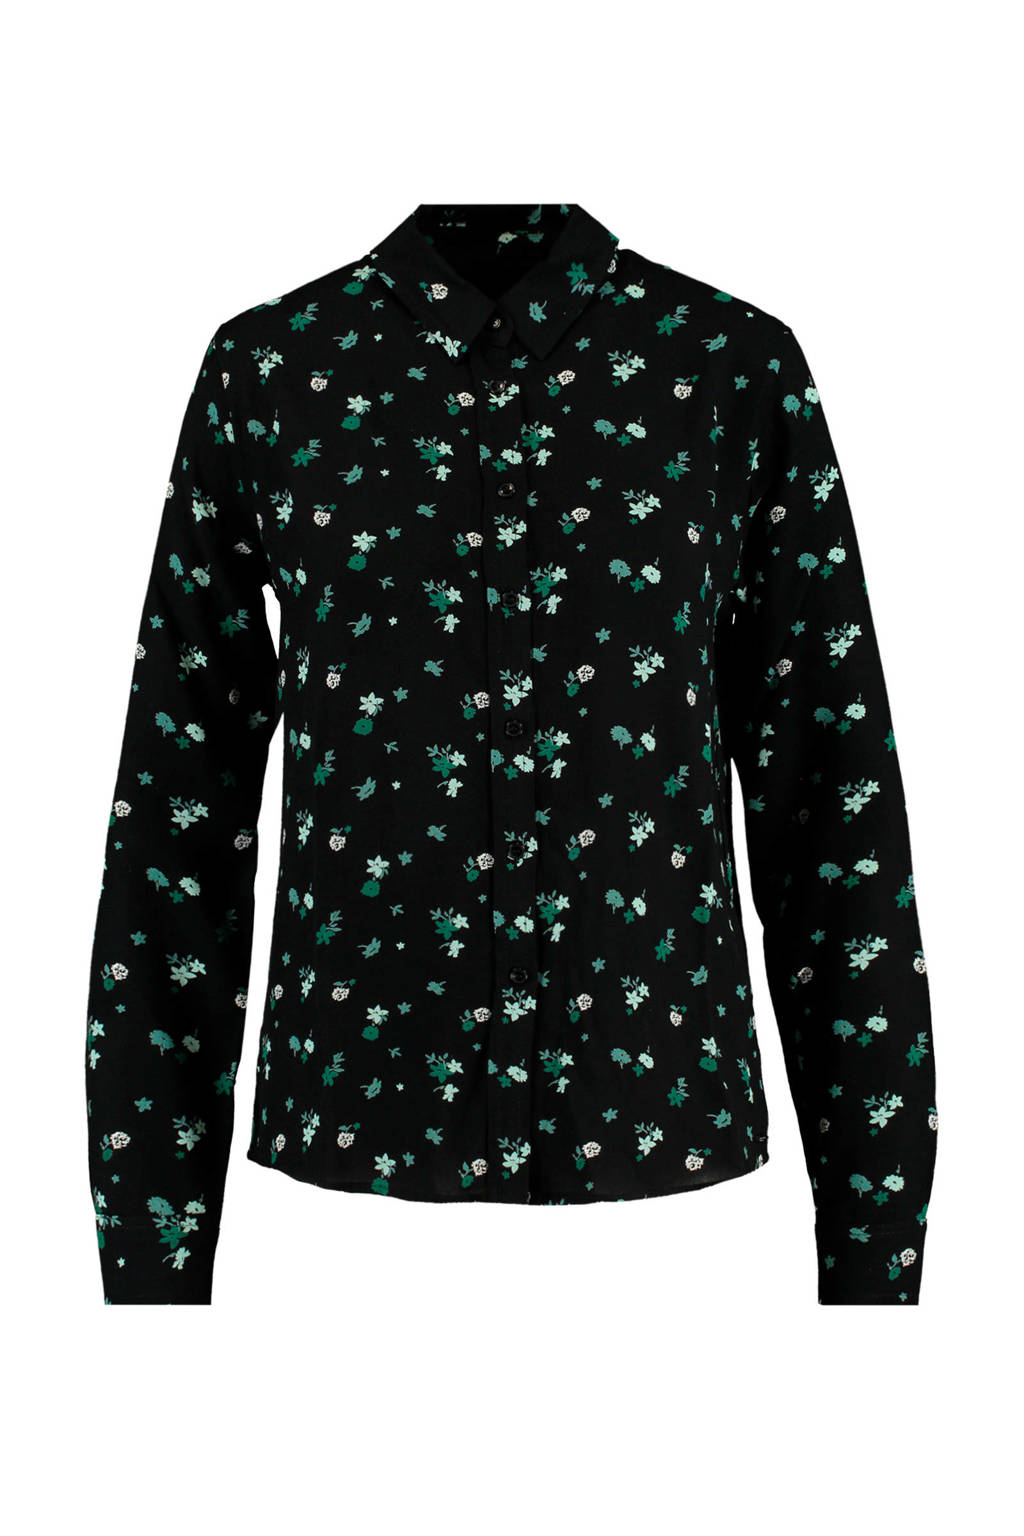 America Today gebloemde blouse Britt black/green, Black/green